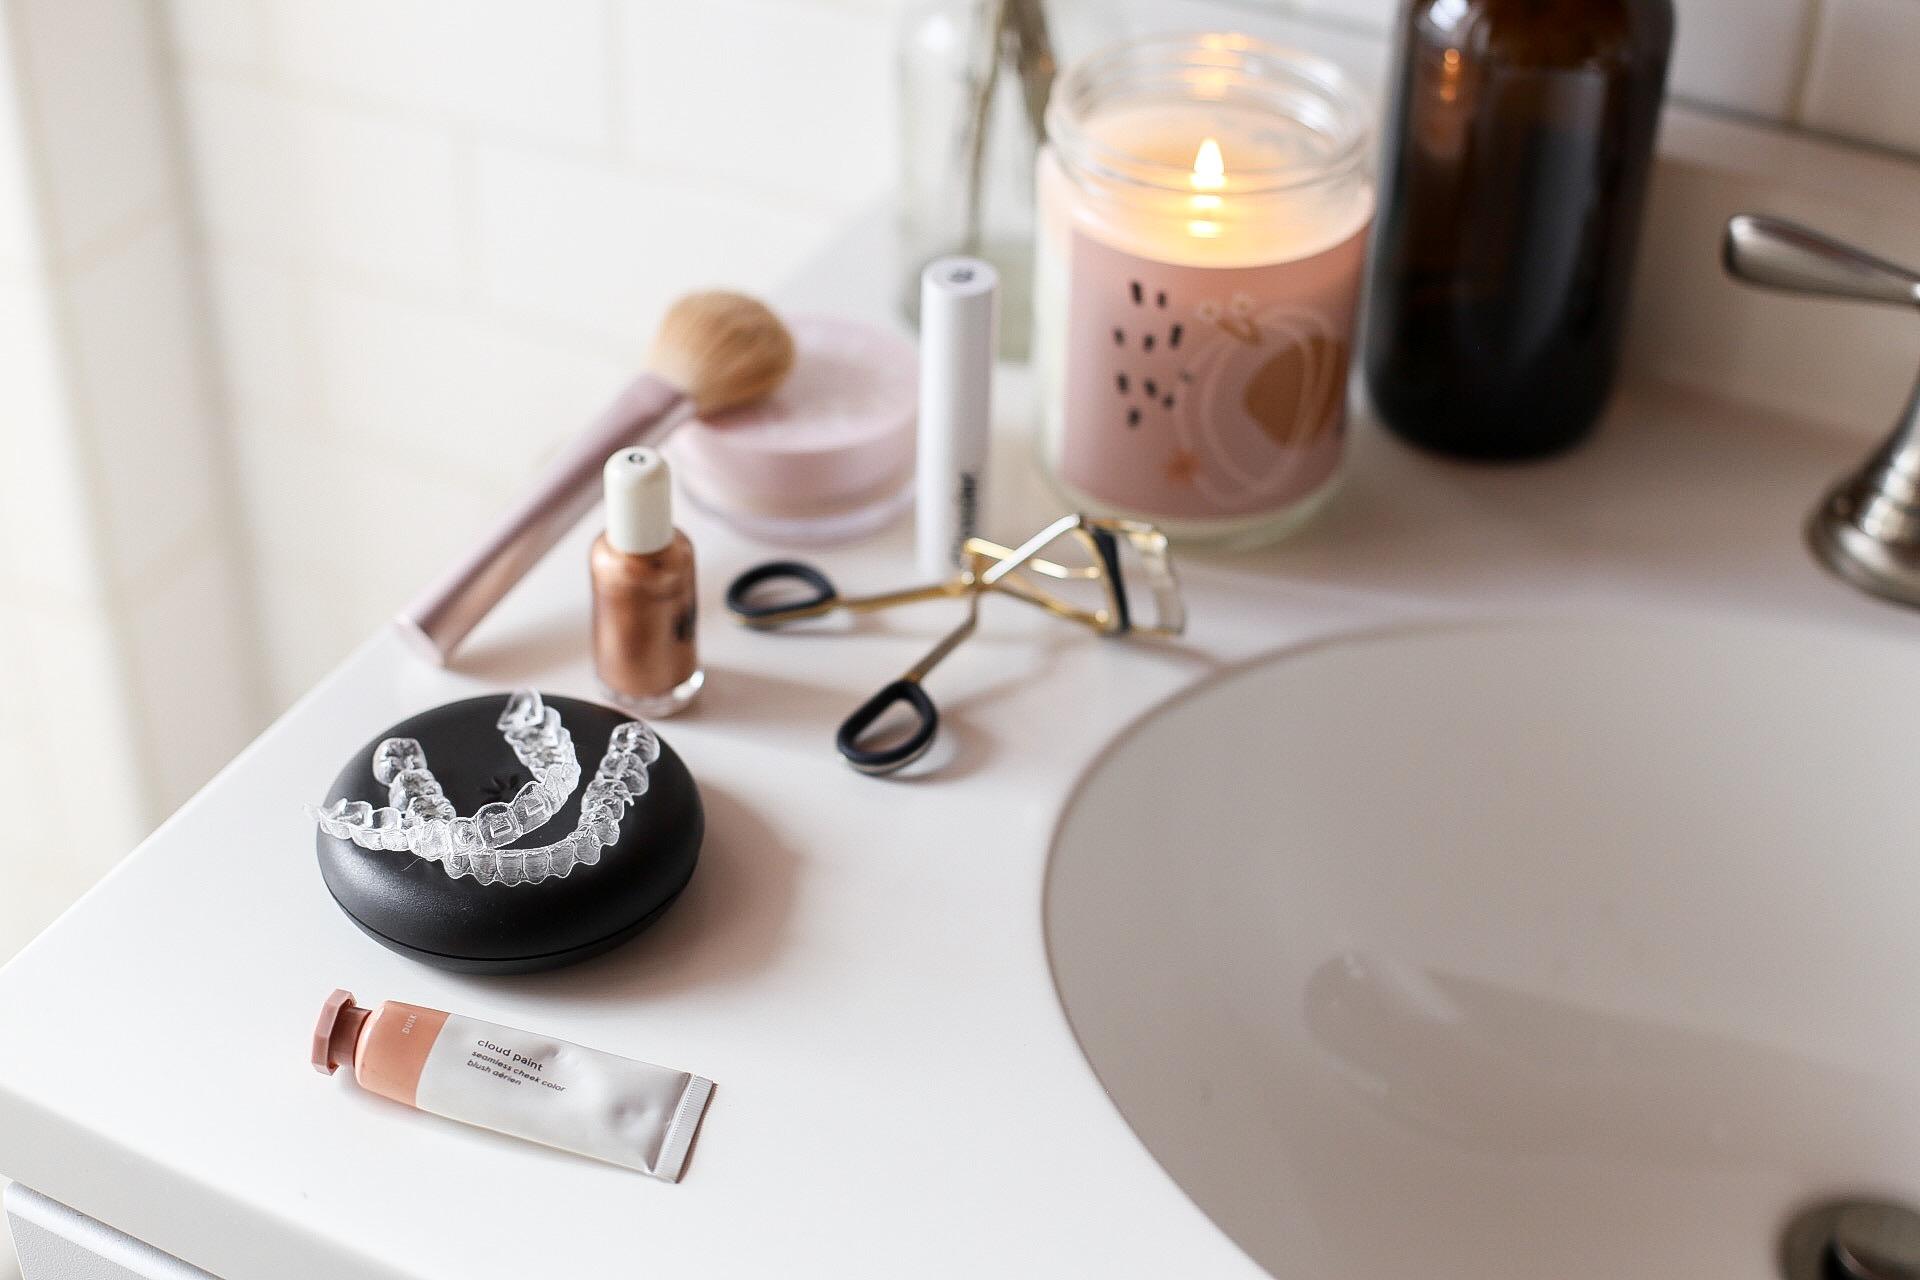 MY INVISALIGN JOURNEY WITH ORTHODONTIC ASSOCIATES  |  Viklund Made Brittany Viklund Motherhood Interiors Illustration Styling Blog